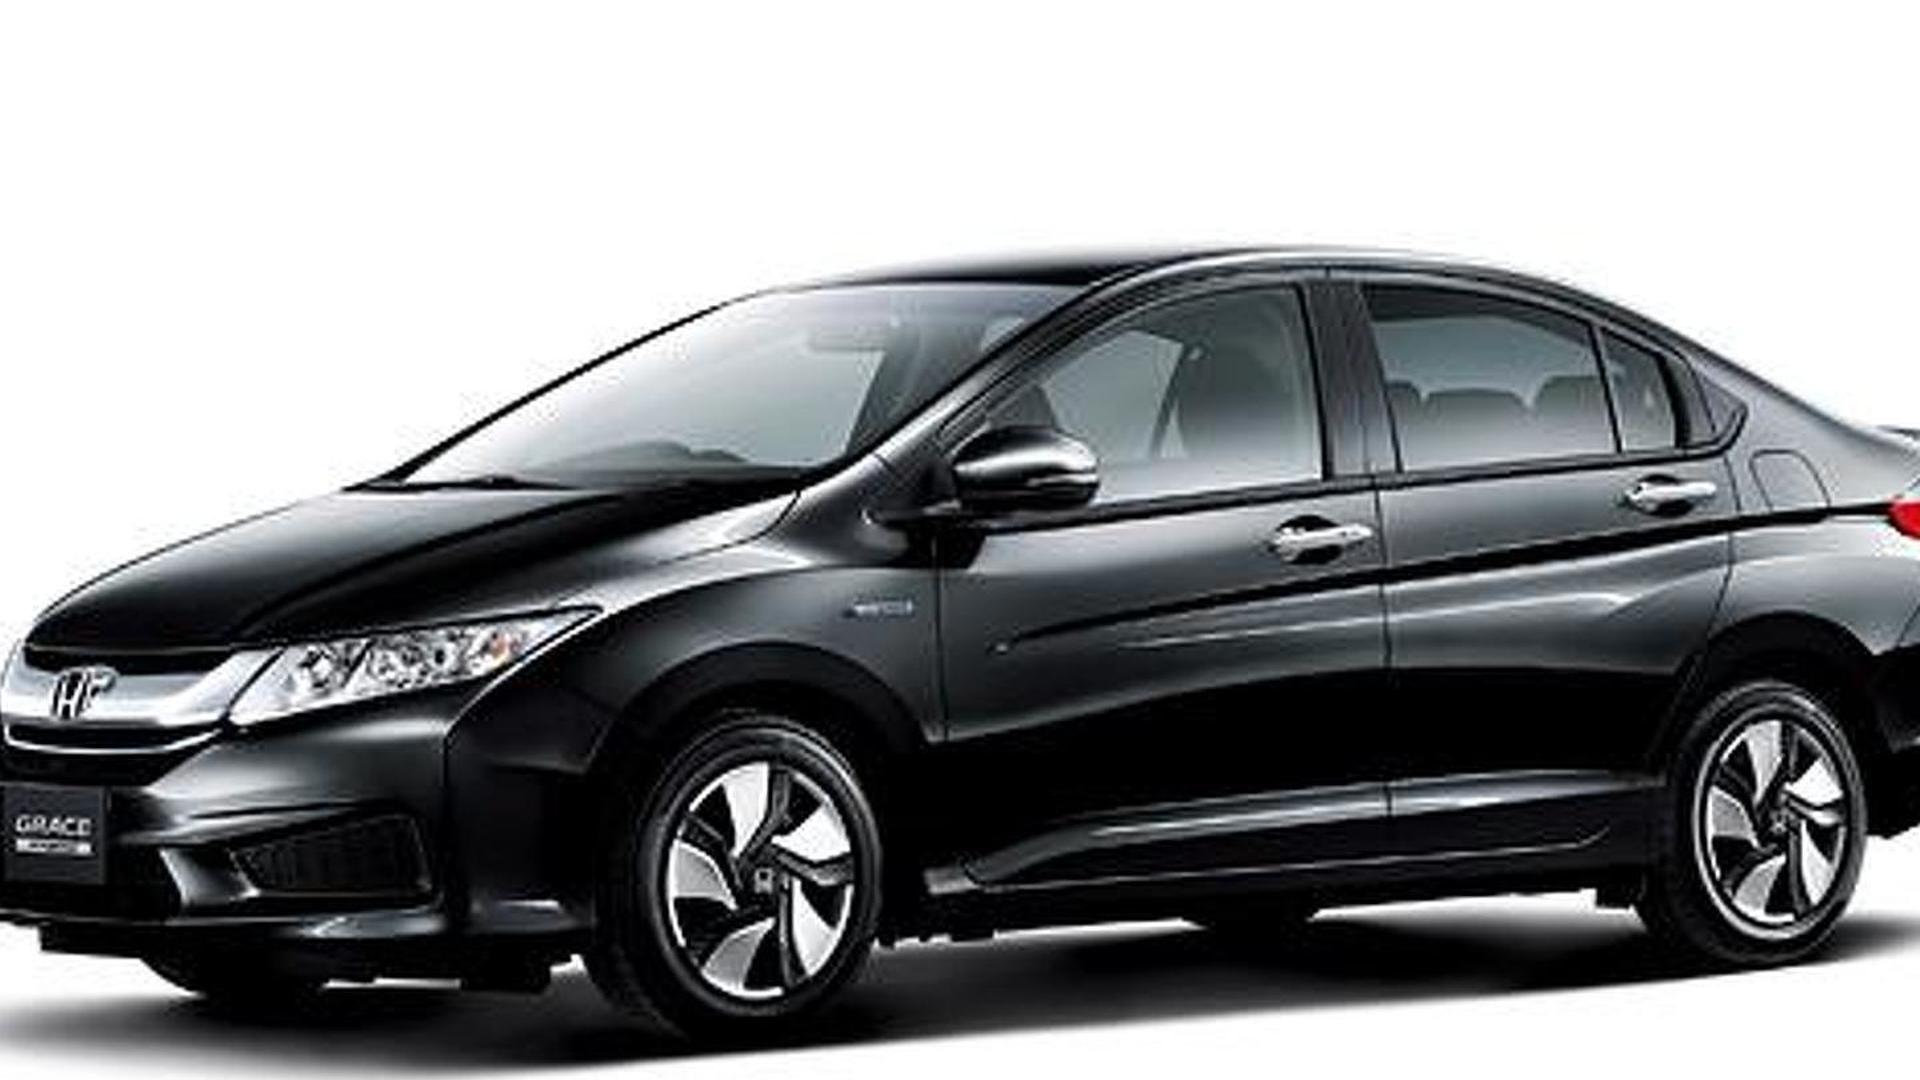 trend first fit cars motor honda look